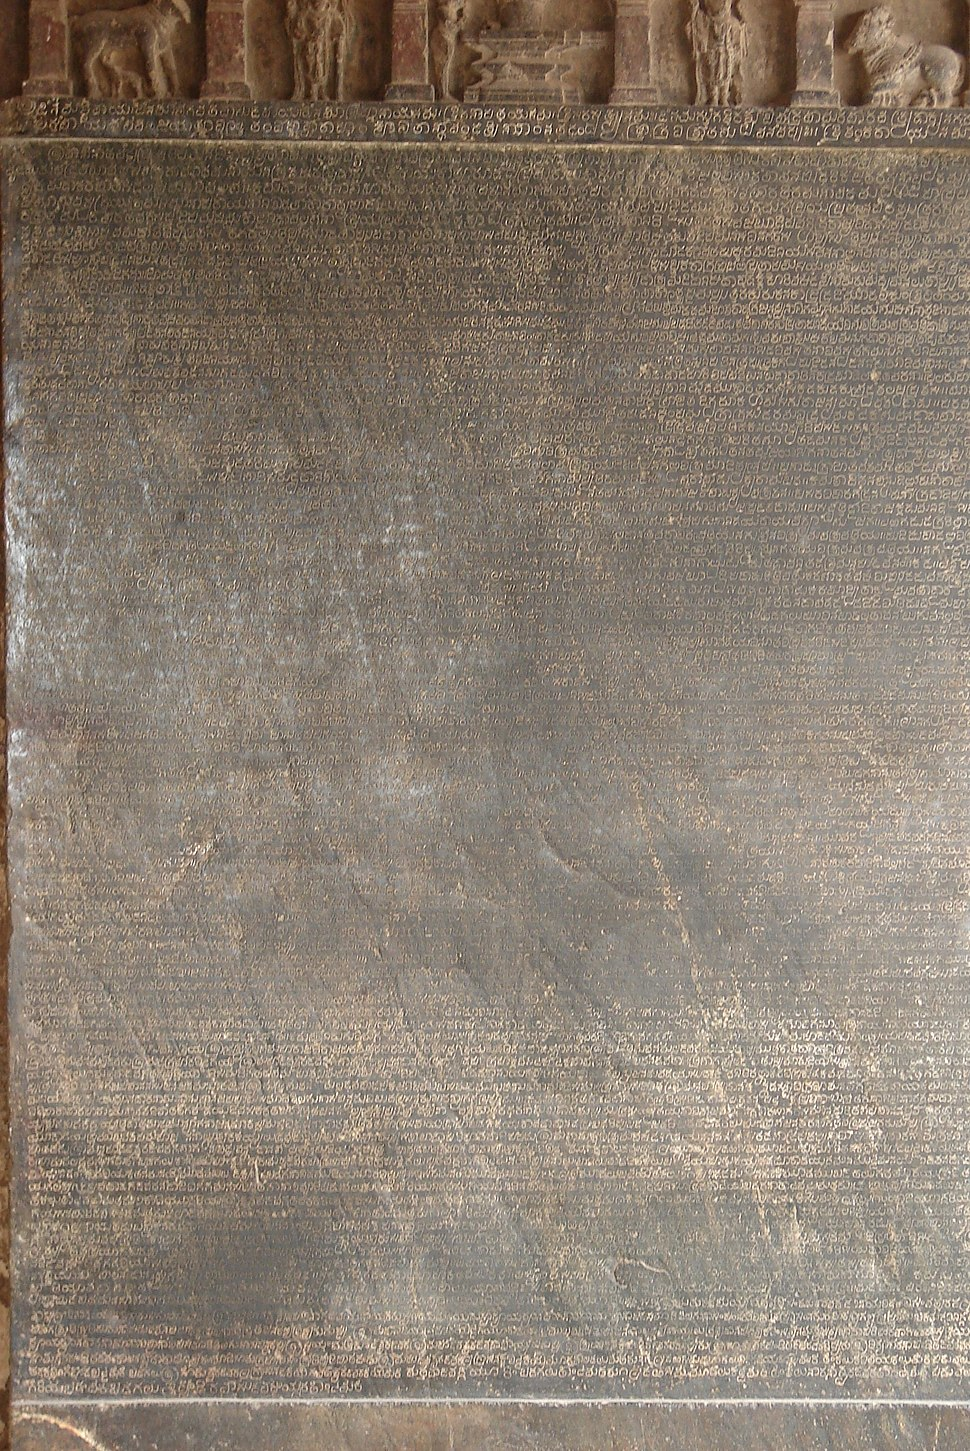 Old Kannada inscription (1112 CE) of King Vikramaditya VI in the Mahadeva temple at Itagi